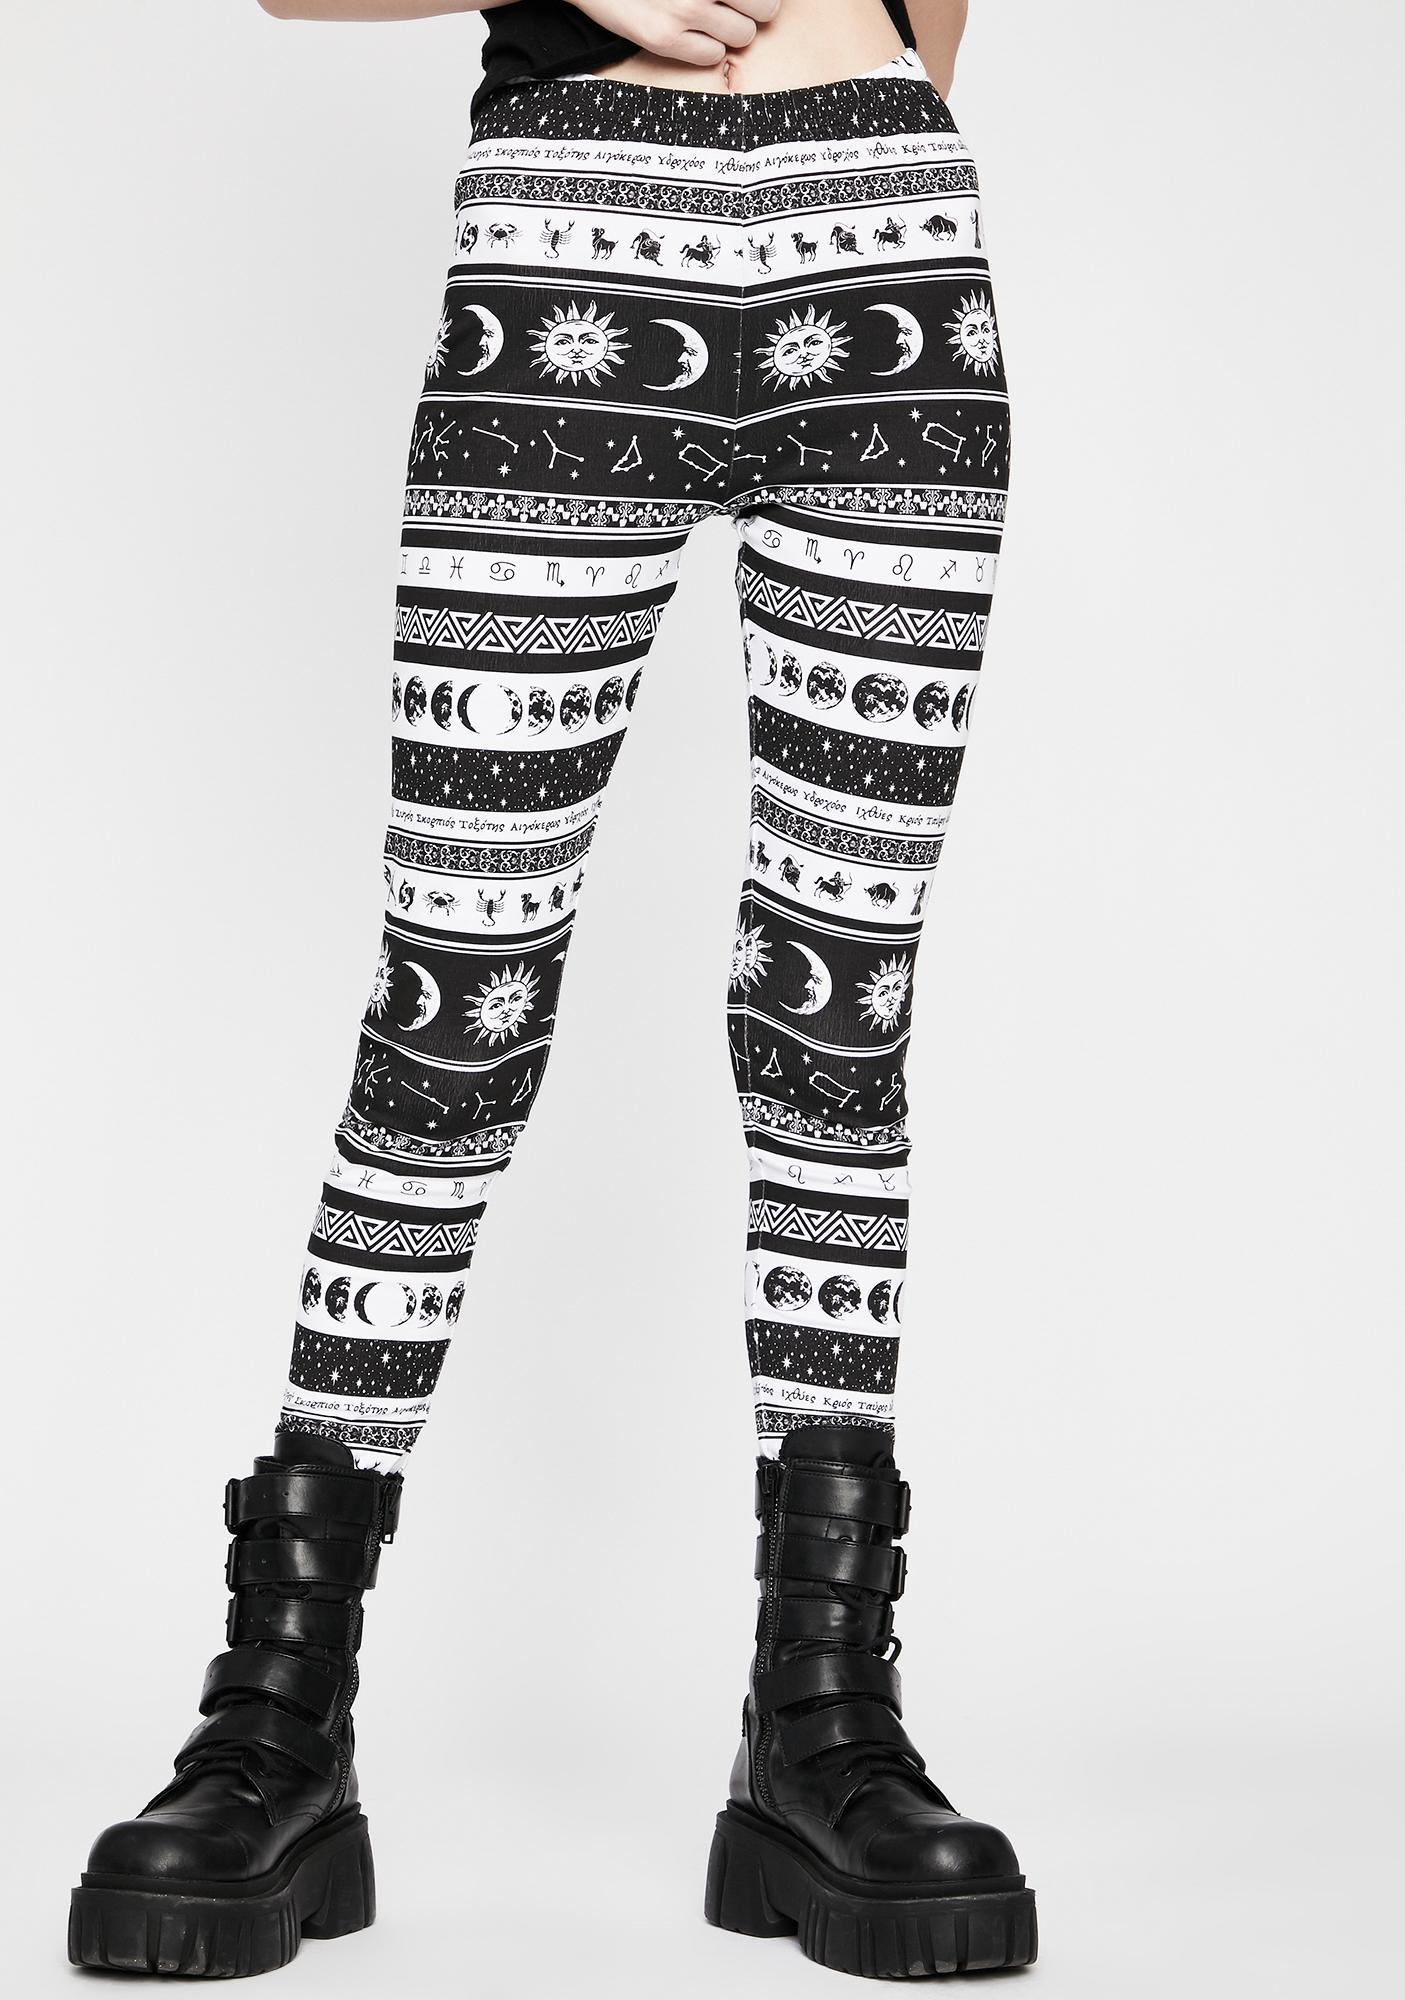 HOROSCOPEZ Divine Dreamcatcher Printed Leggings